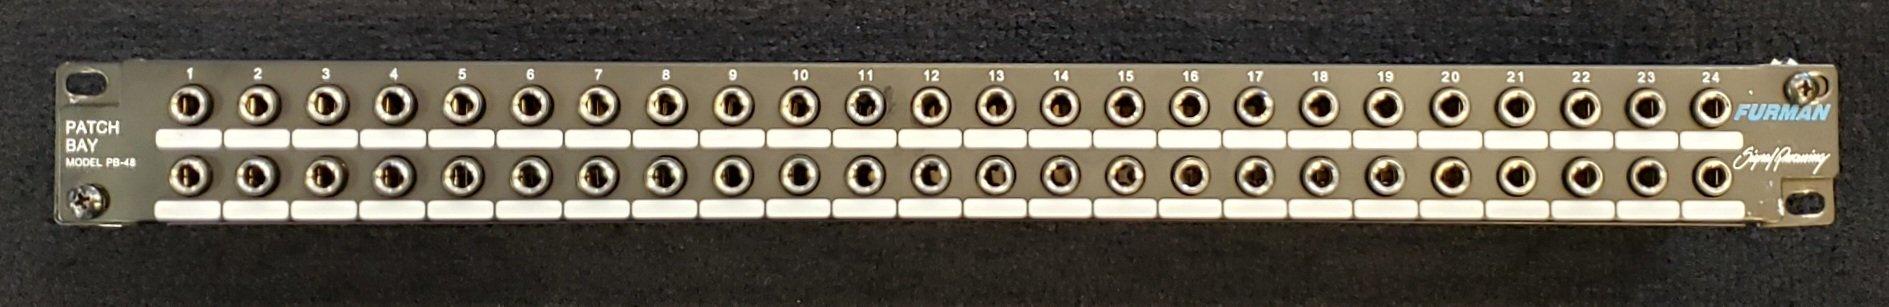 FURMAN PB-40 48-POINT PATCHBAY